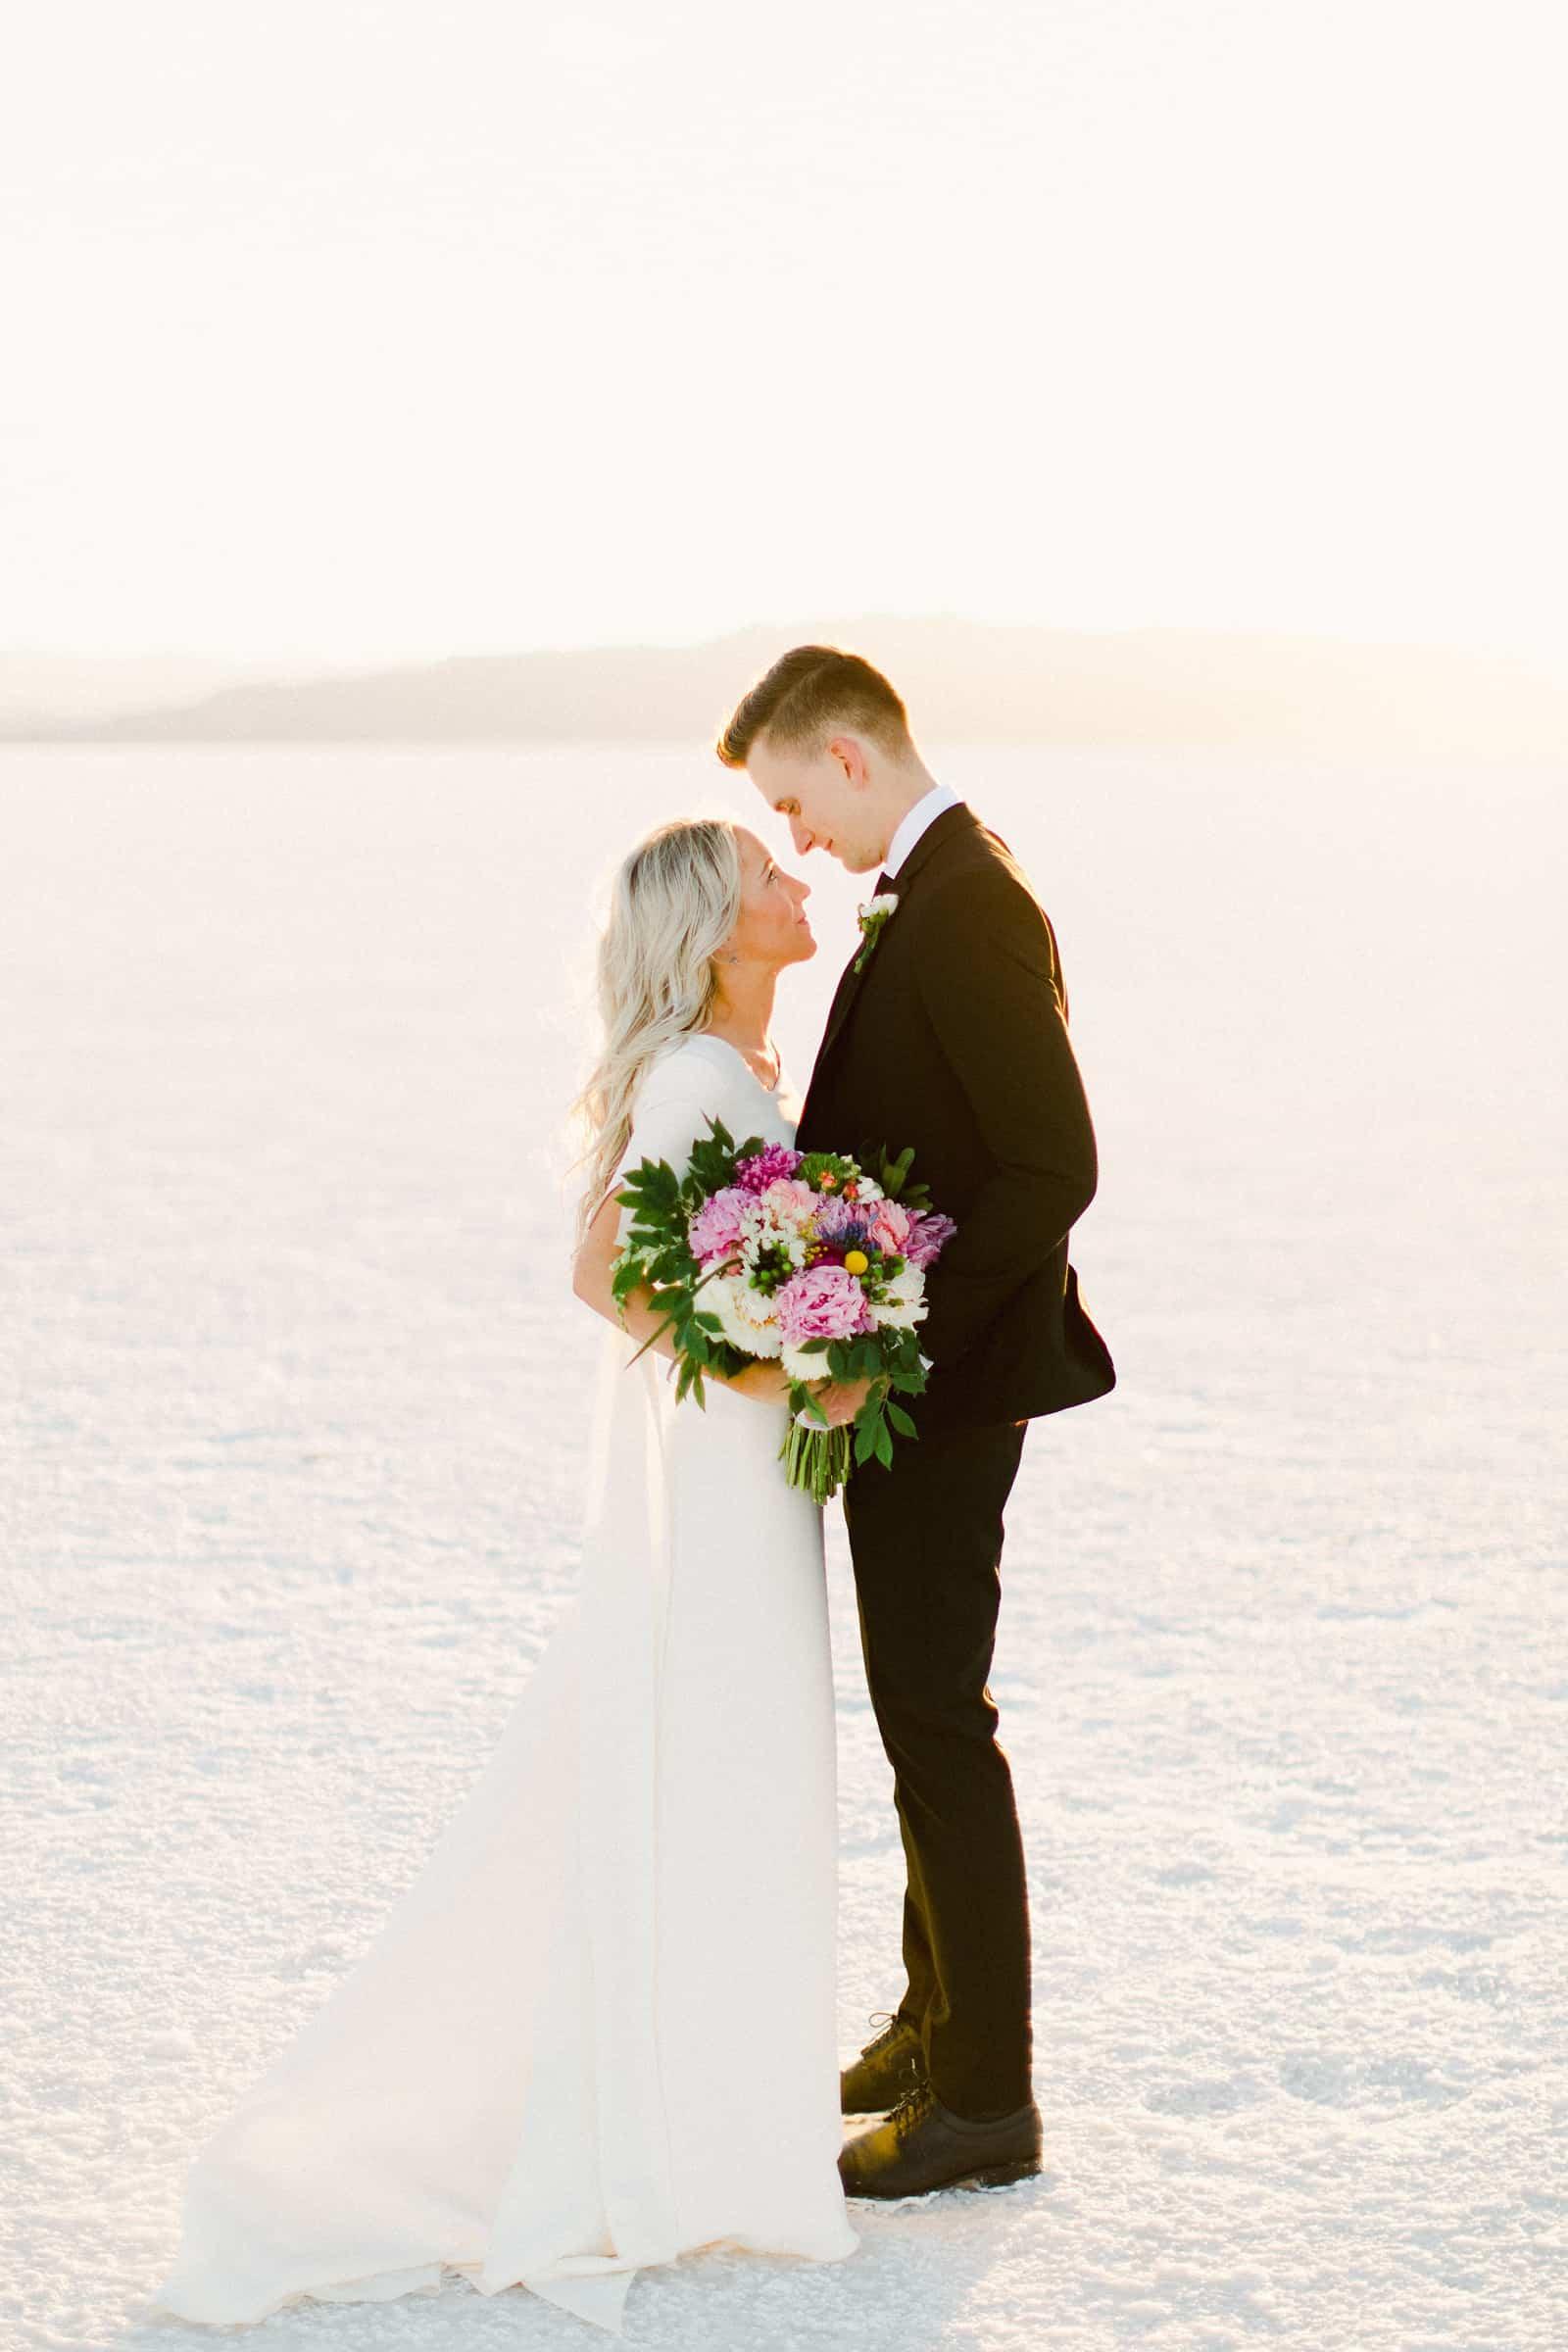 Bonneville Salt Flats Utah Wedding Photography, destination wedding